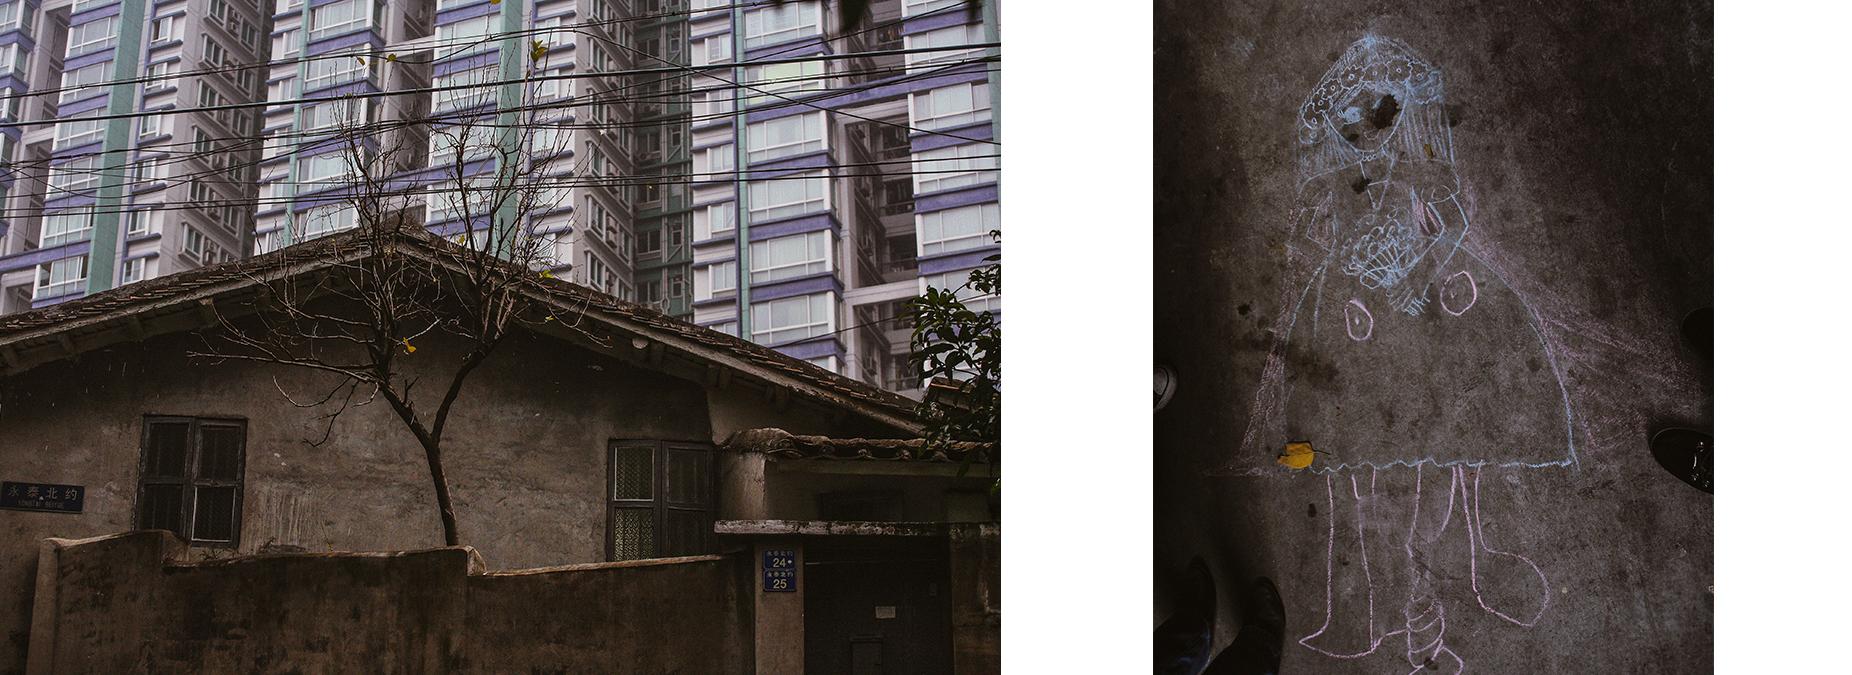 Damien NIkora_China007_0004_Layer 1 copy 21.jpg